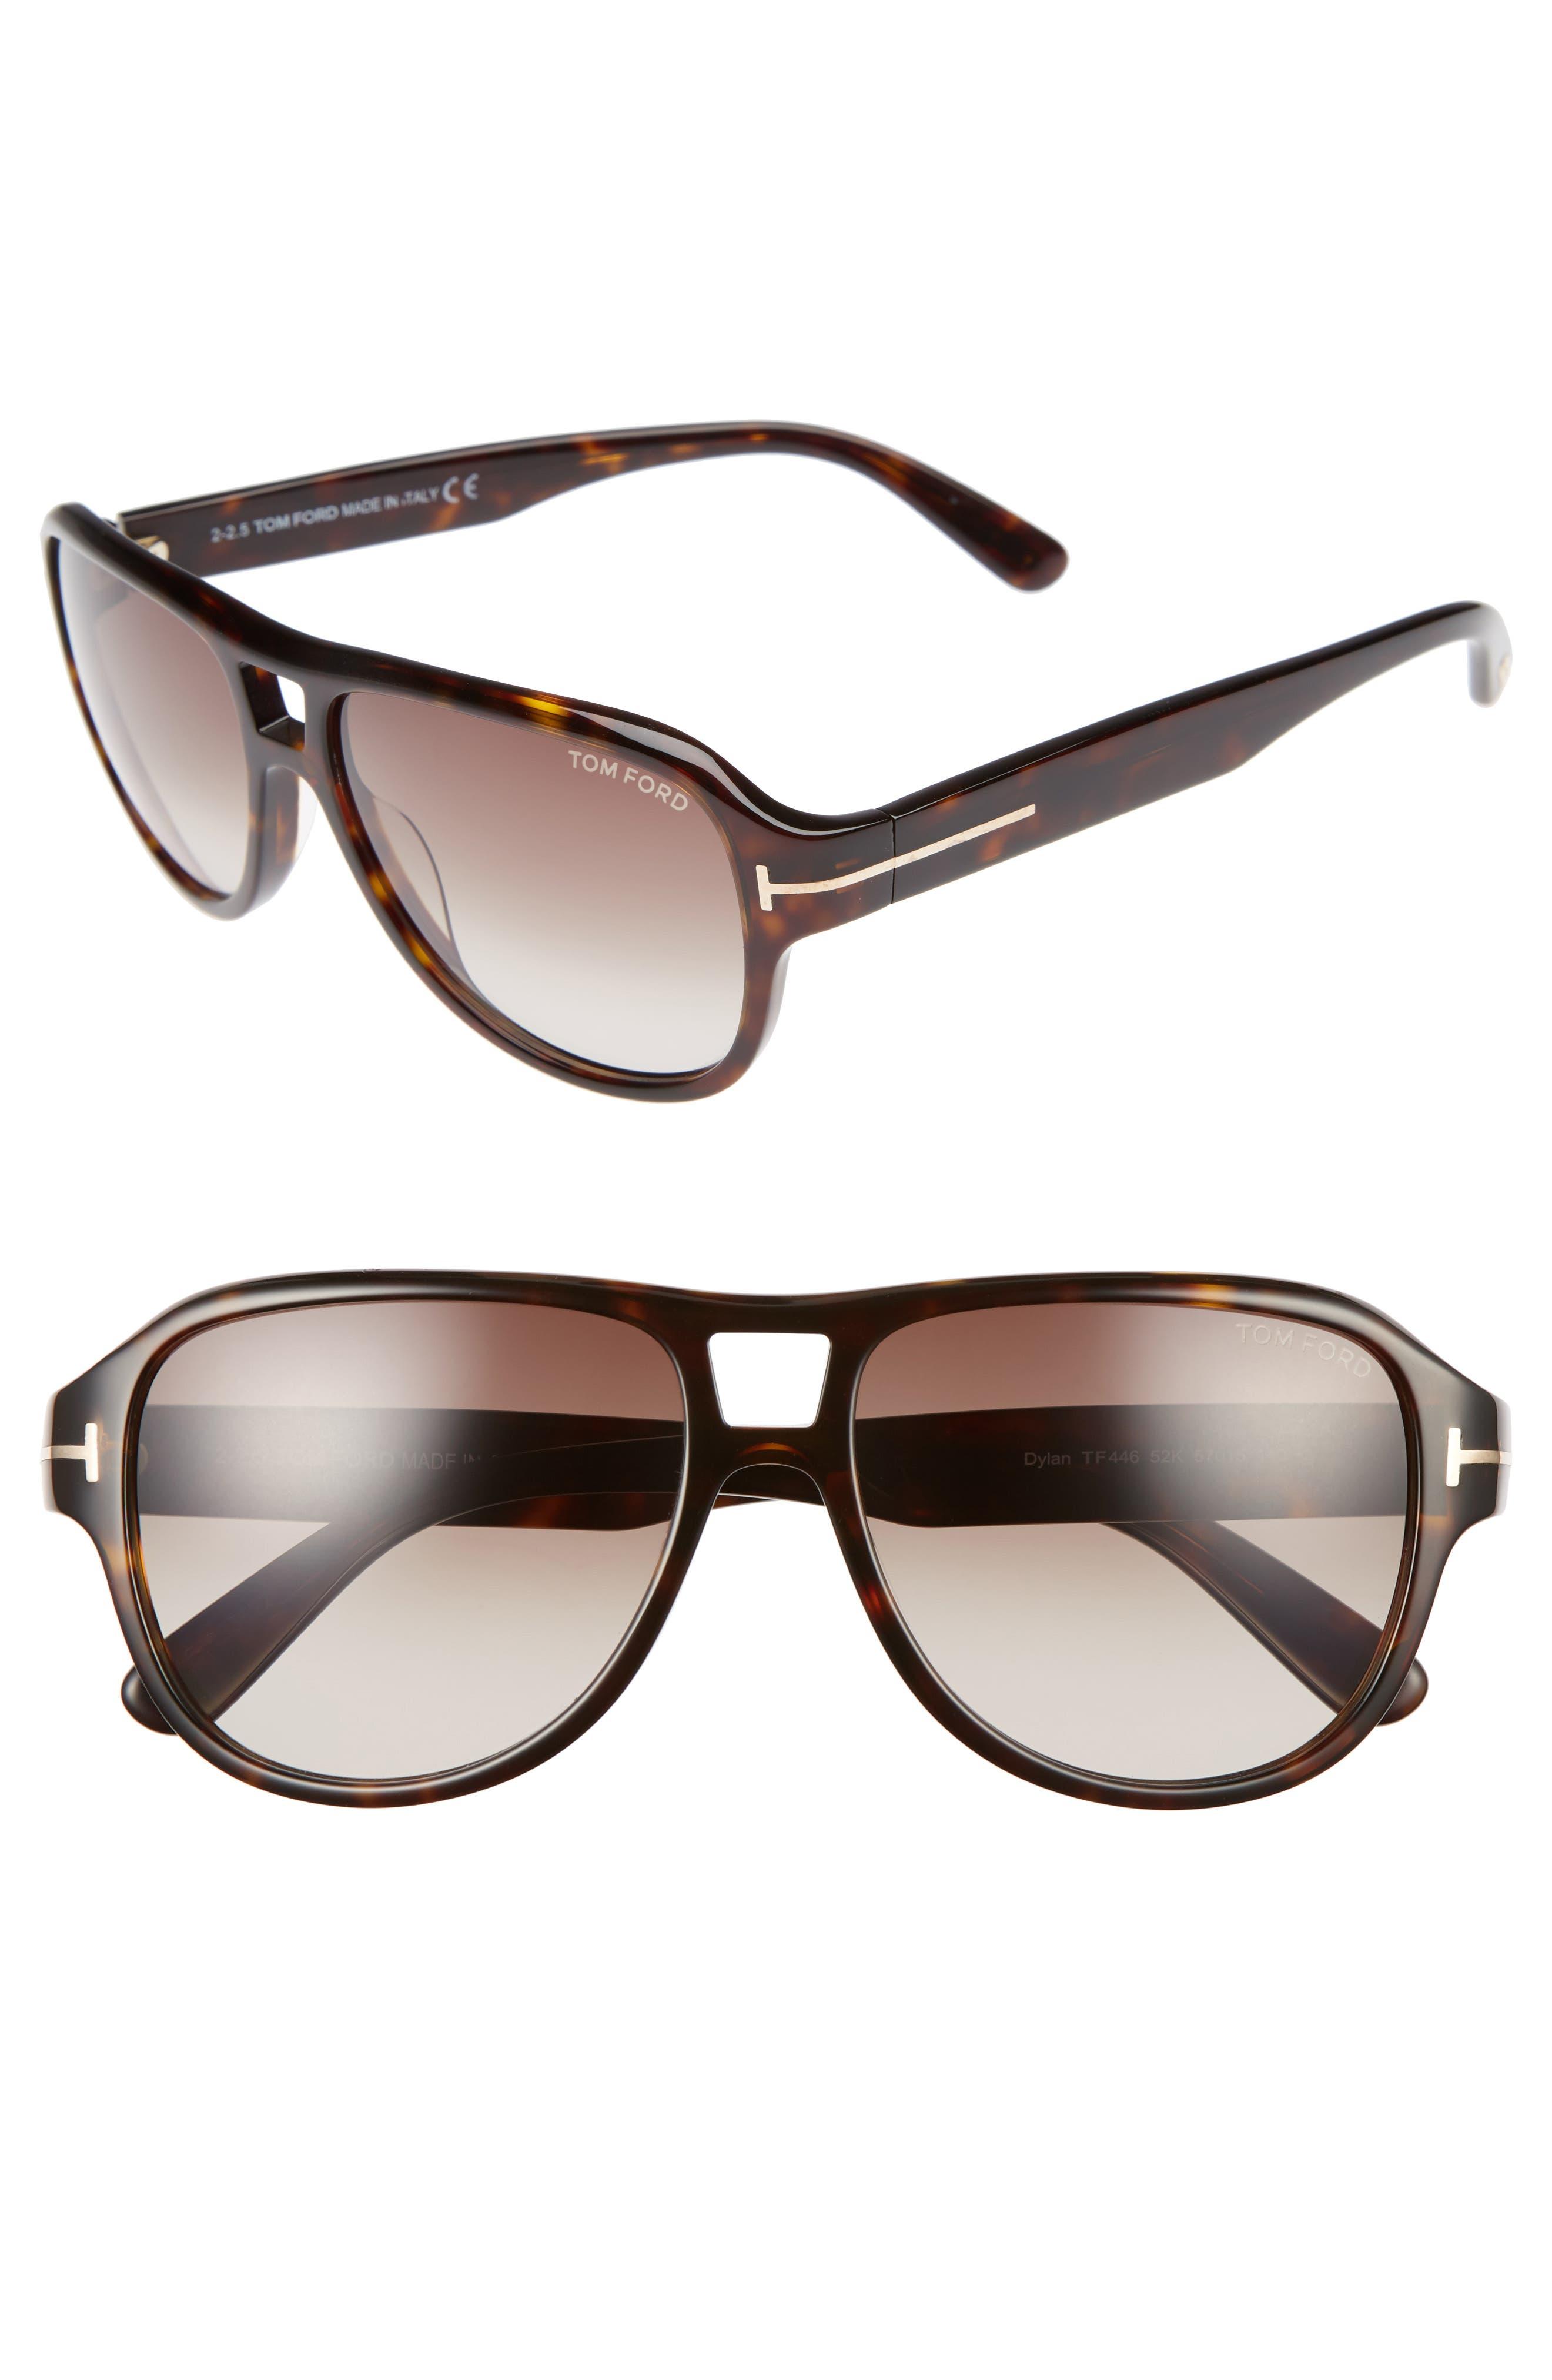 Philippa 55mm Gradient Round Aviator Sunglasses,                             Main thumbnail 1, color,                             001